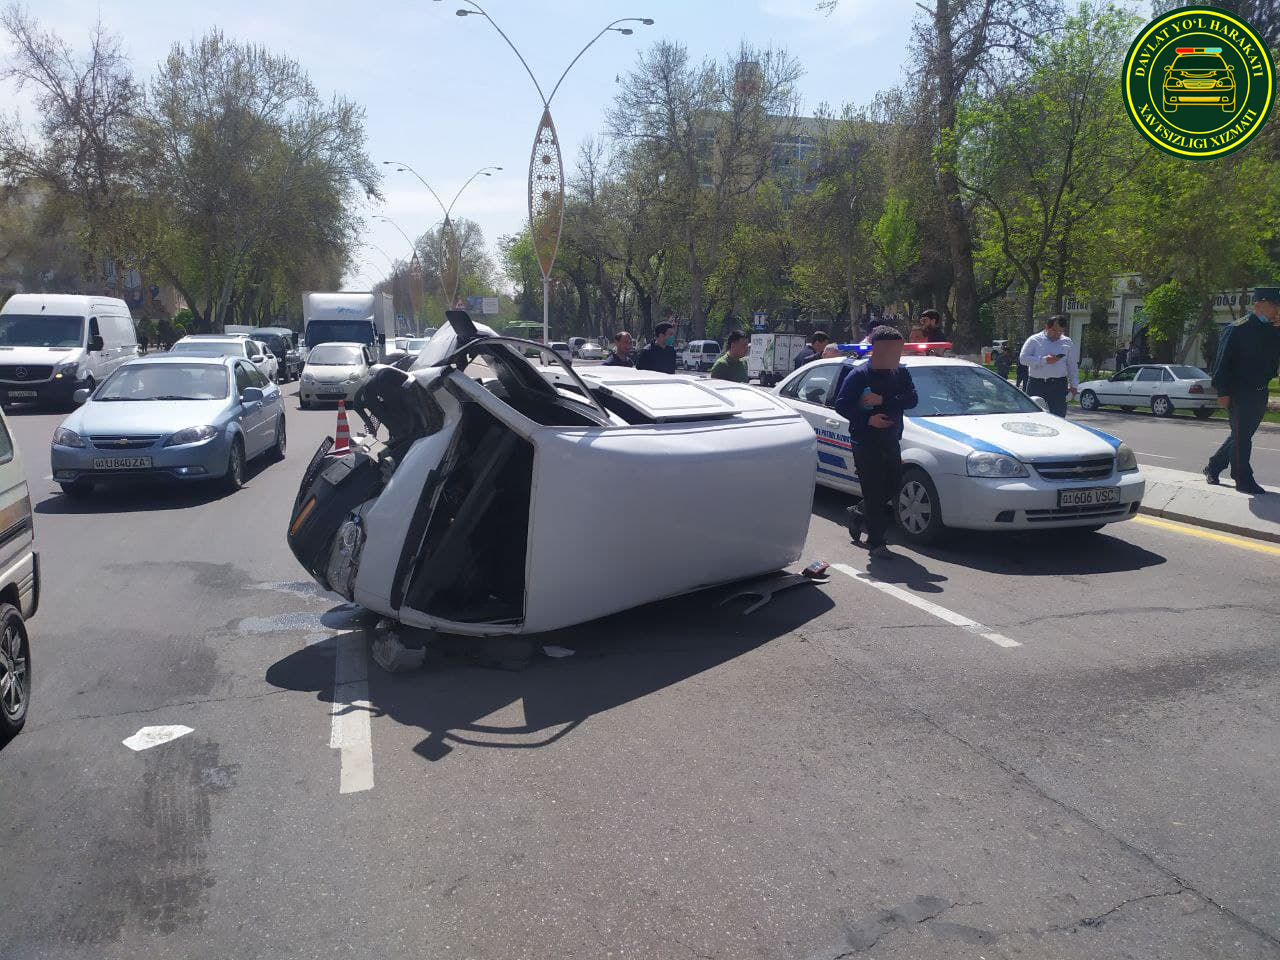 Тошкентда 3 та автомобиль иштирокида ЙТҲ содир бўлди